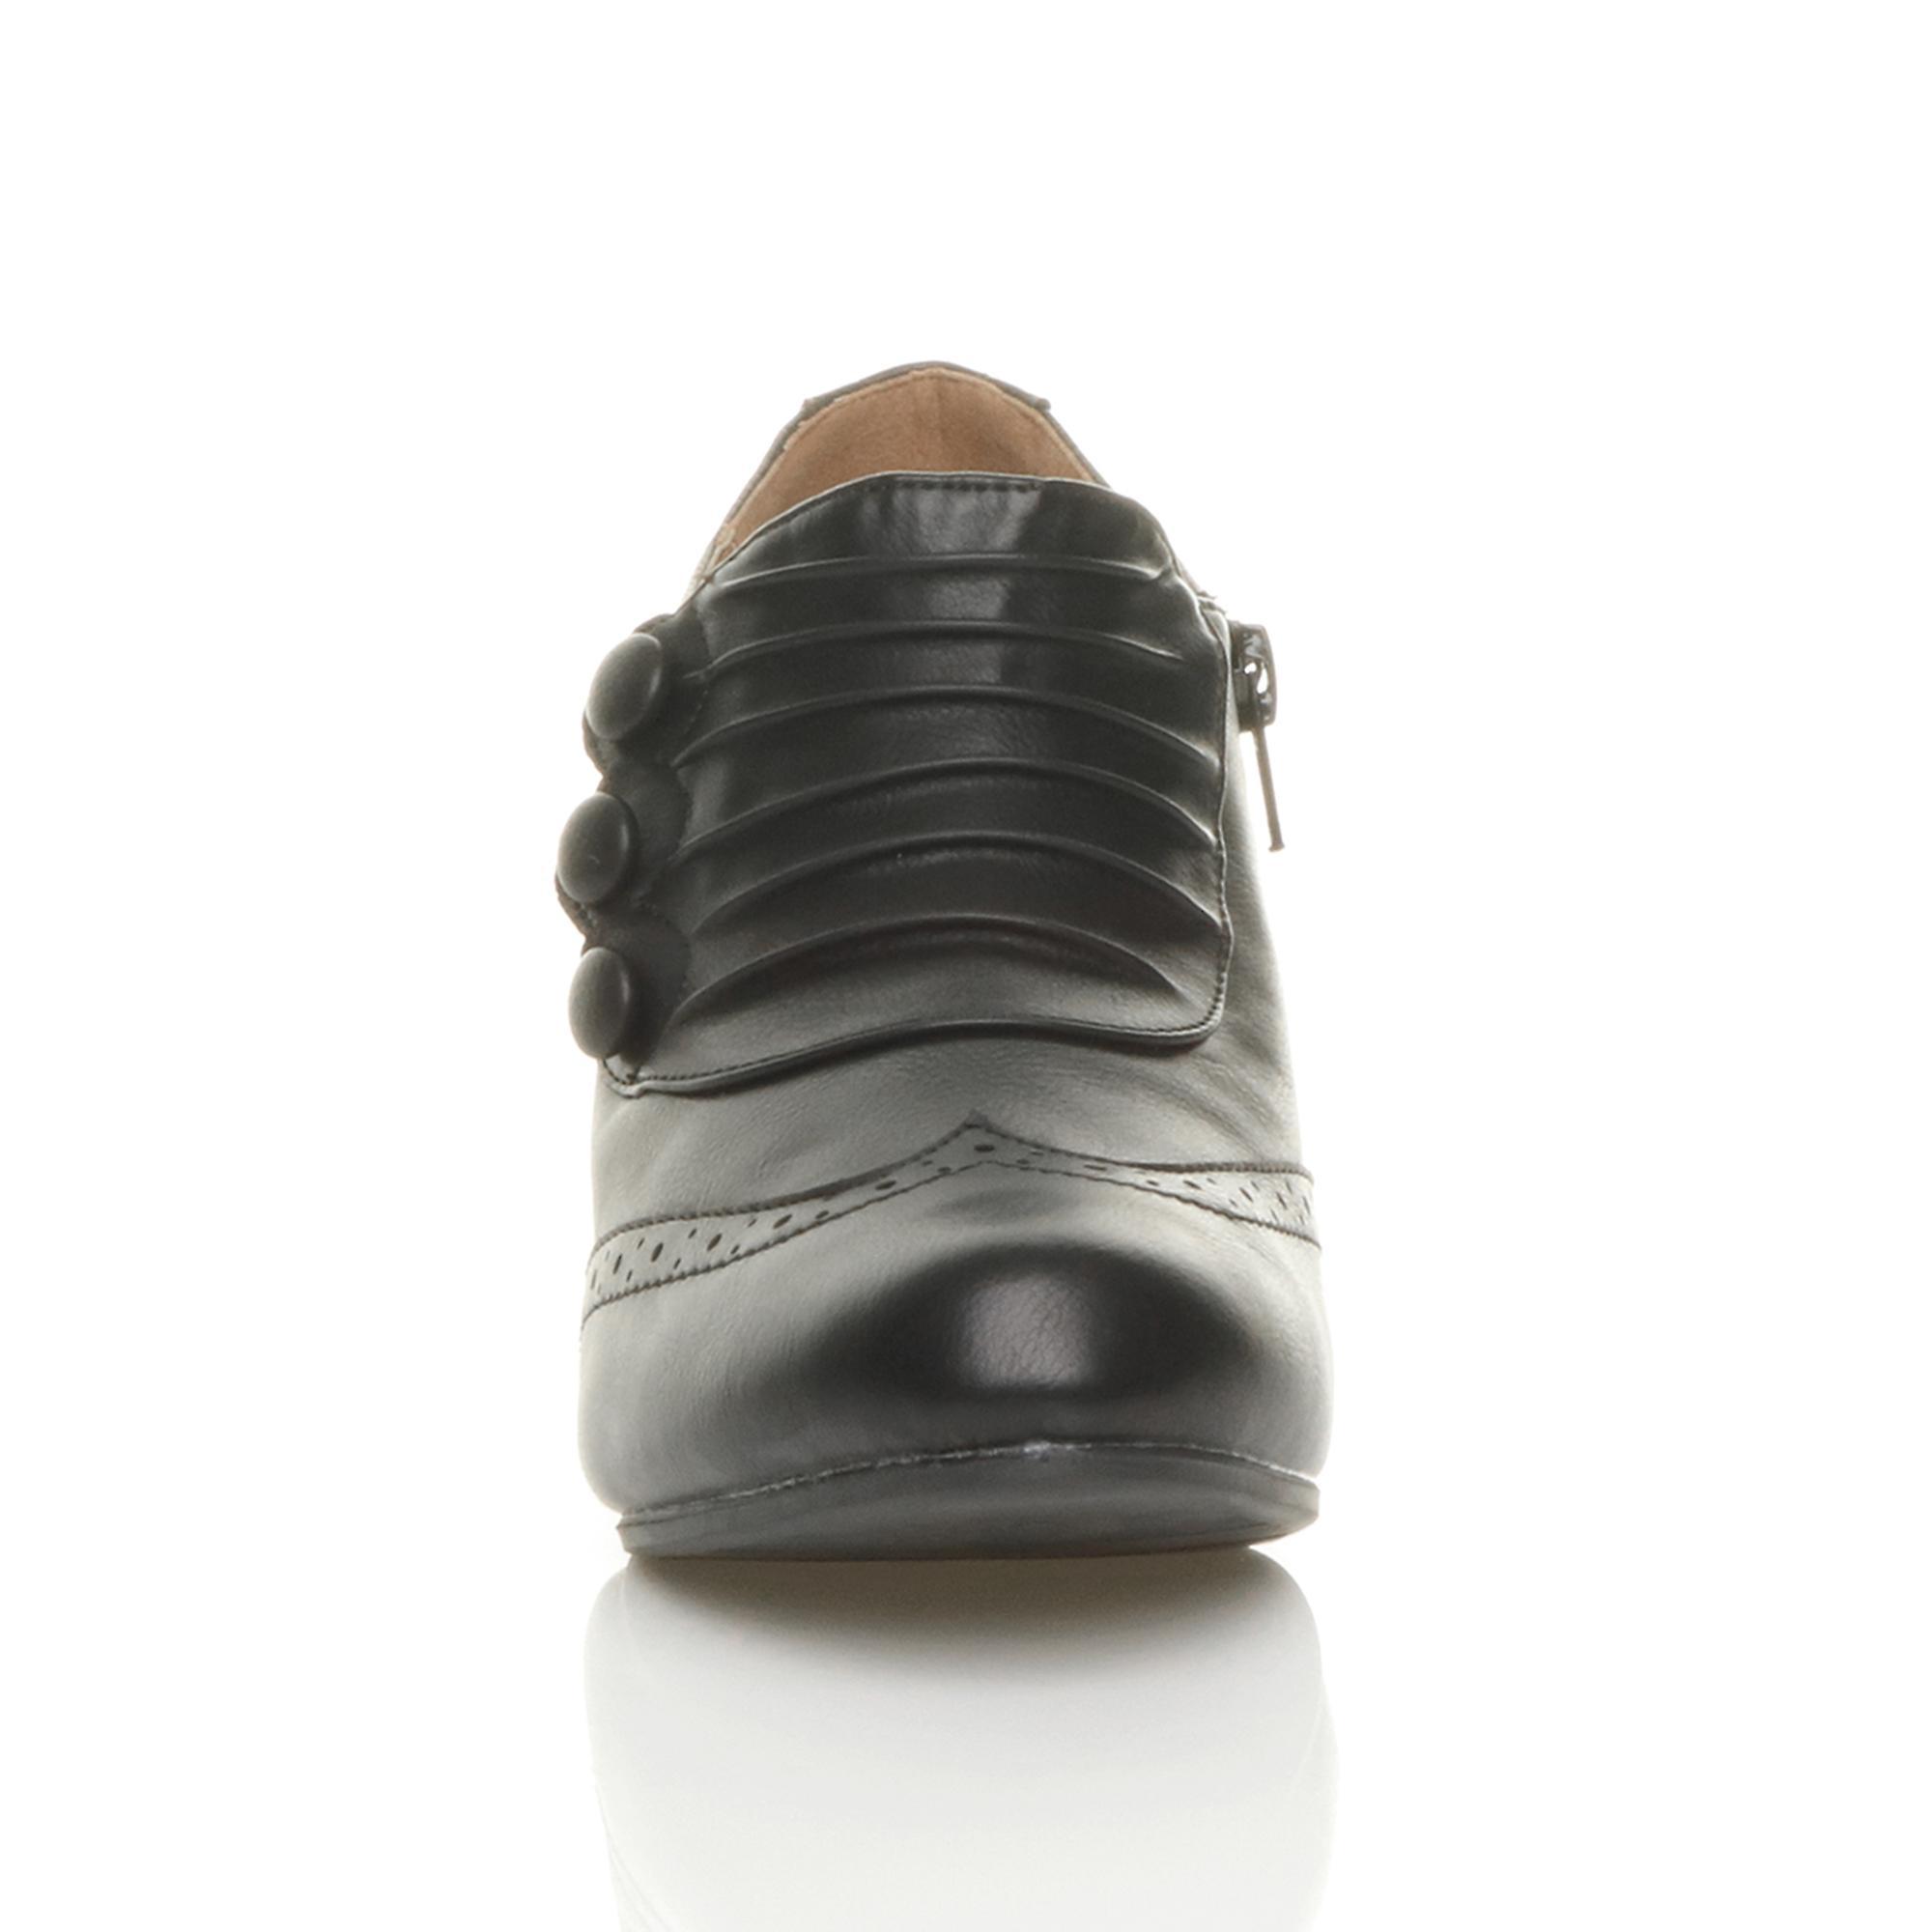 Womens Ajvani milieu talon boutons zip brogue smart cheville chaussure bottes bottillons